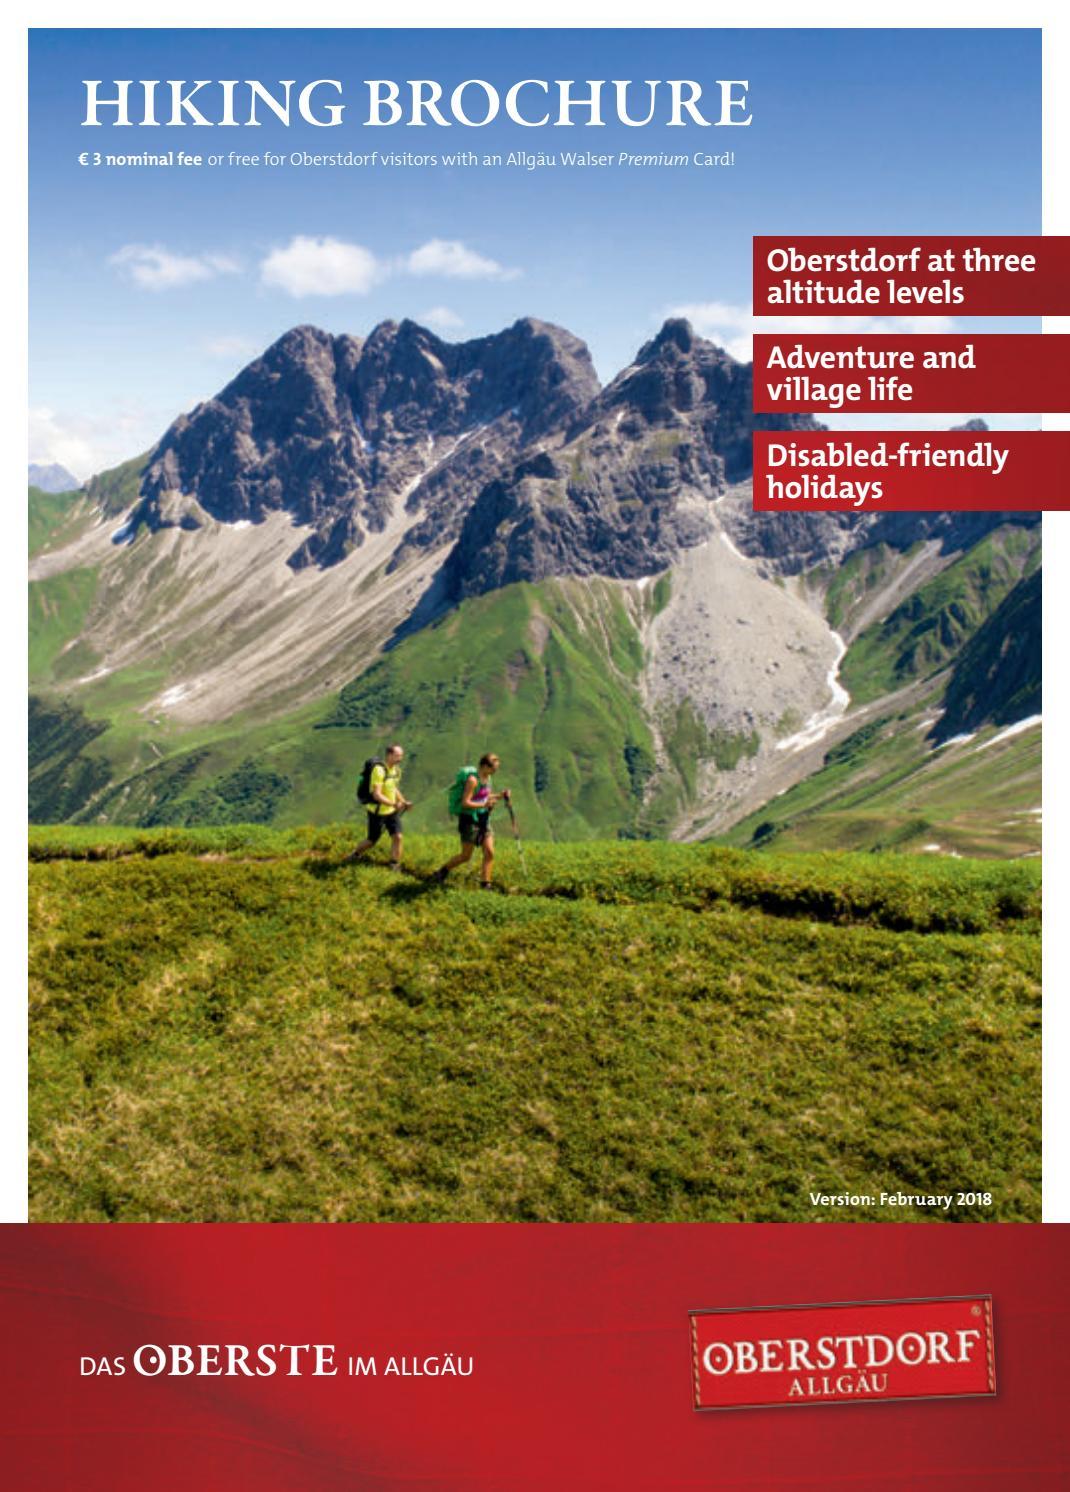 Hiking Brochure 2018 By Tourismus Oberstdorf Issuu